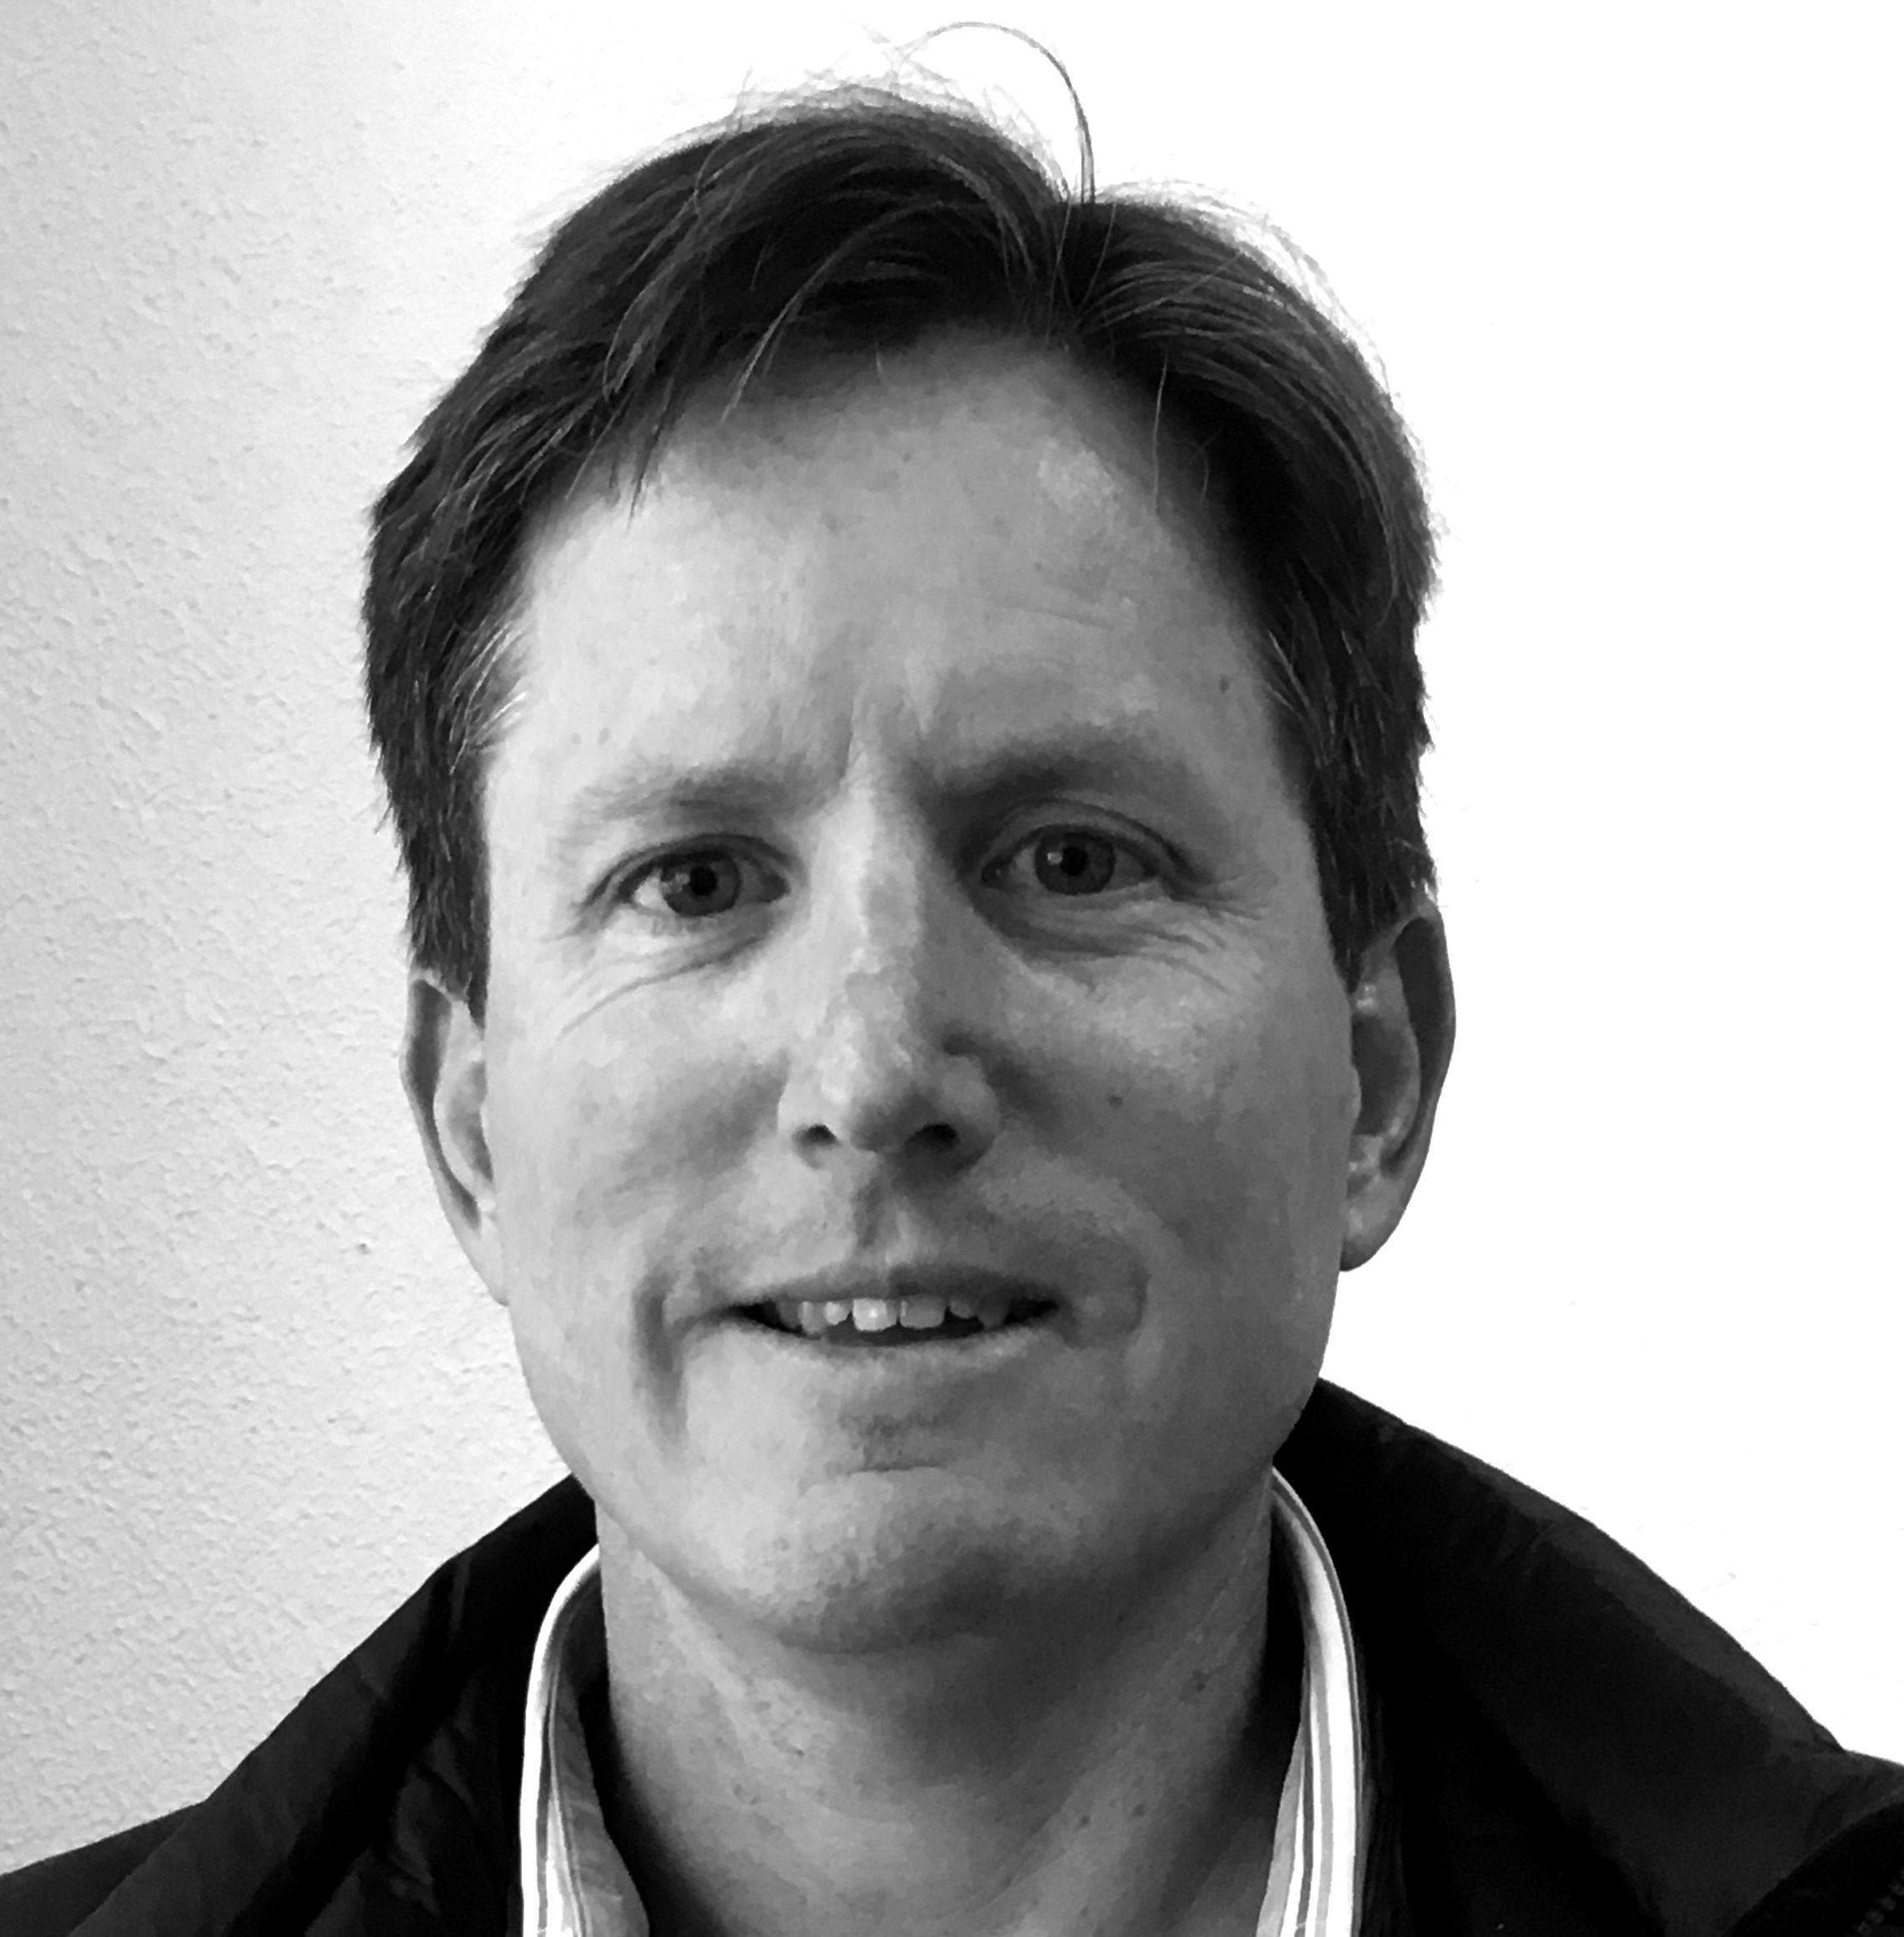 Grant Hechter